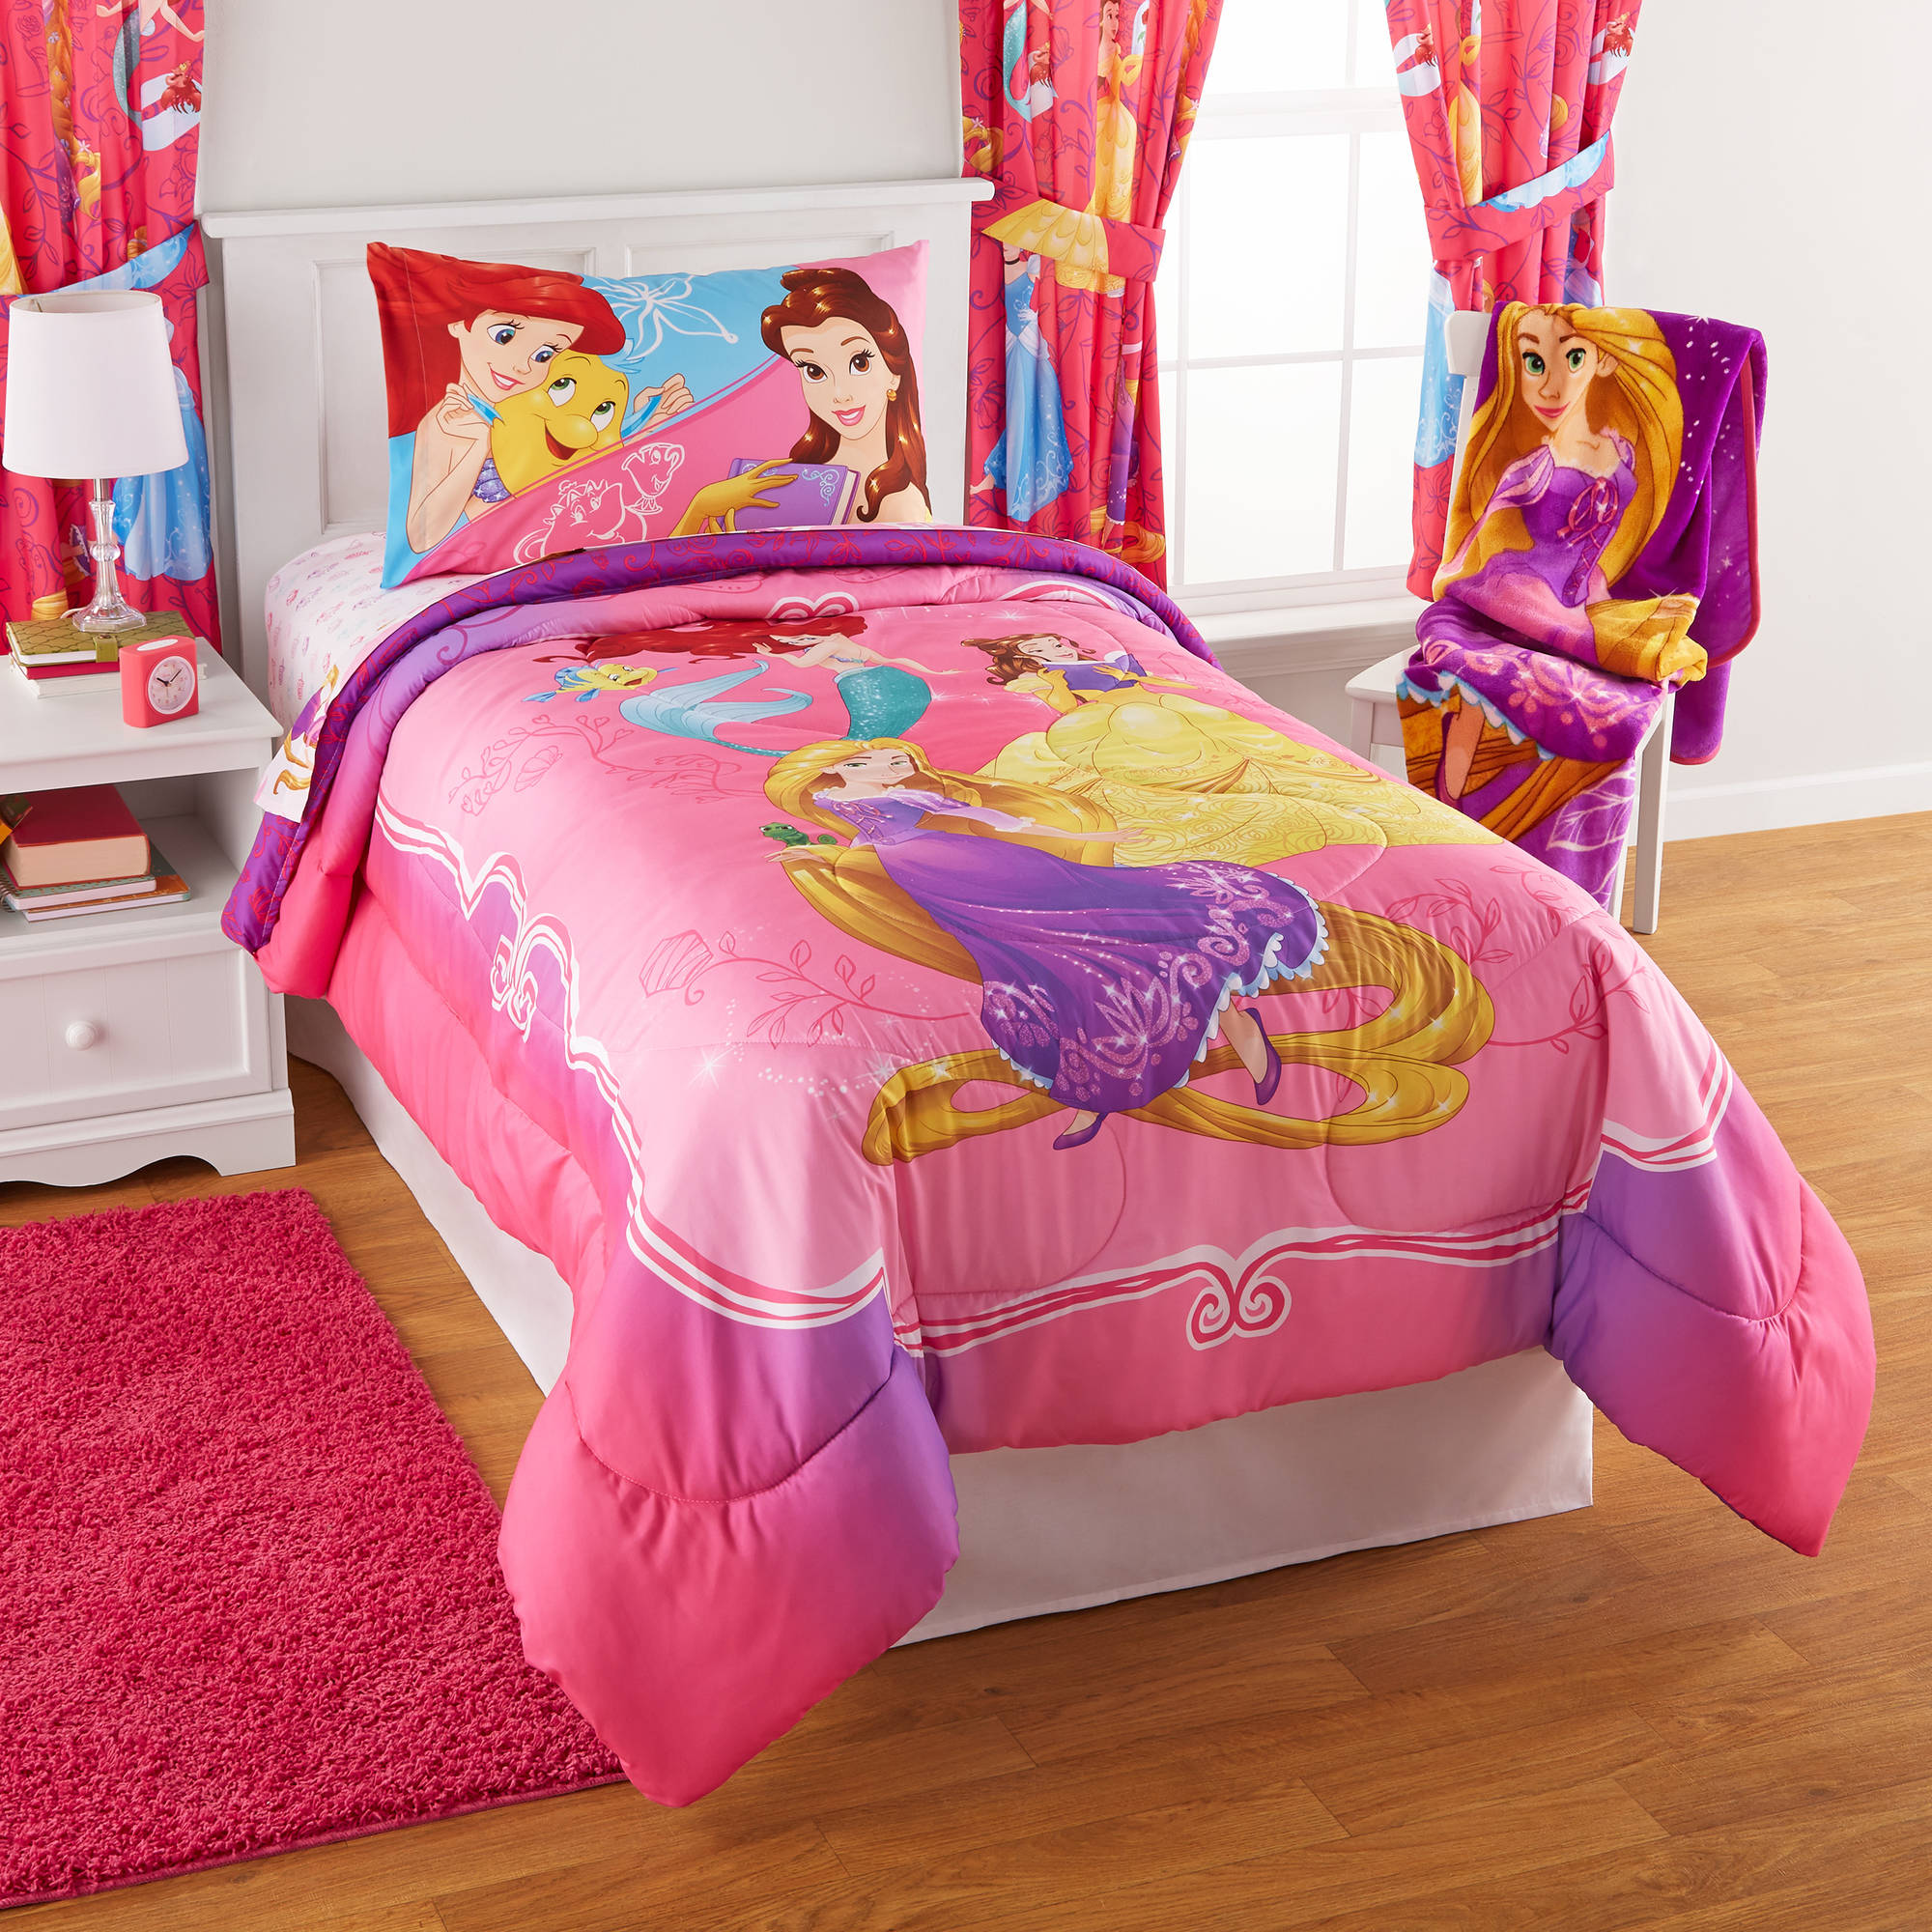 disney princess bedazzling princess reversible twinfull bedding  - disney princess bedazzling princess reversible twinfull bedding comforter walmartcom